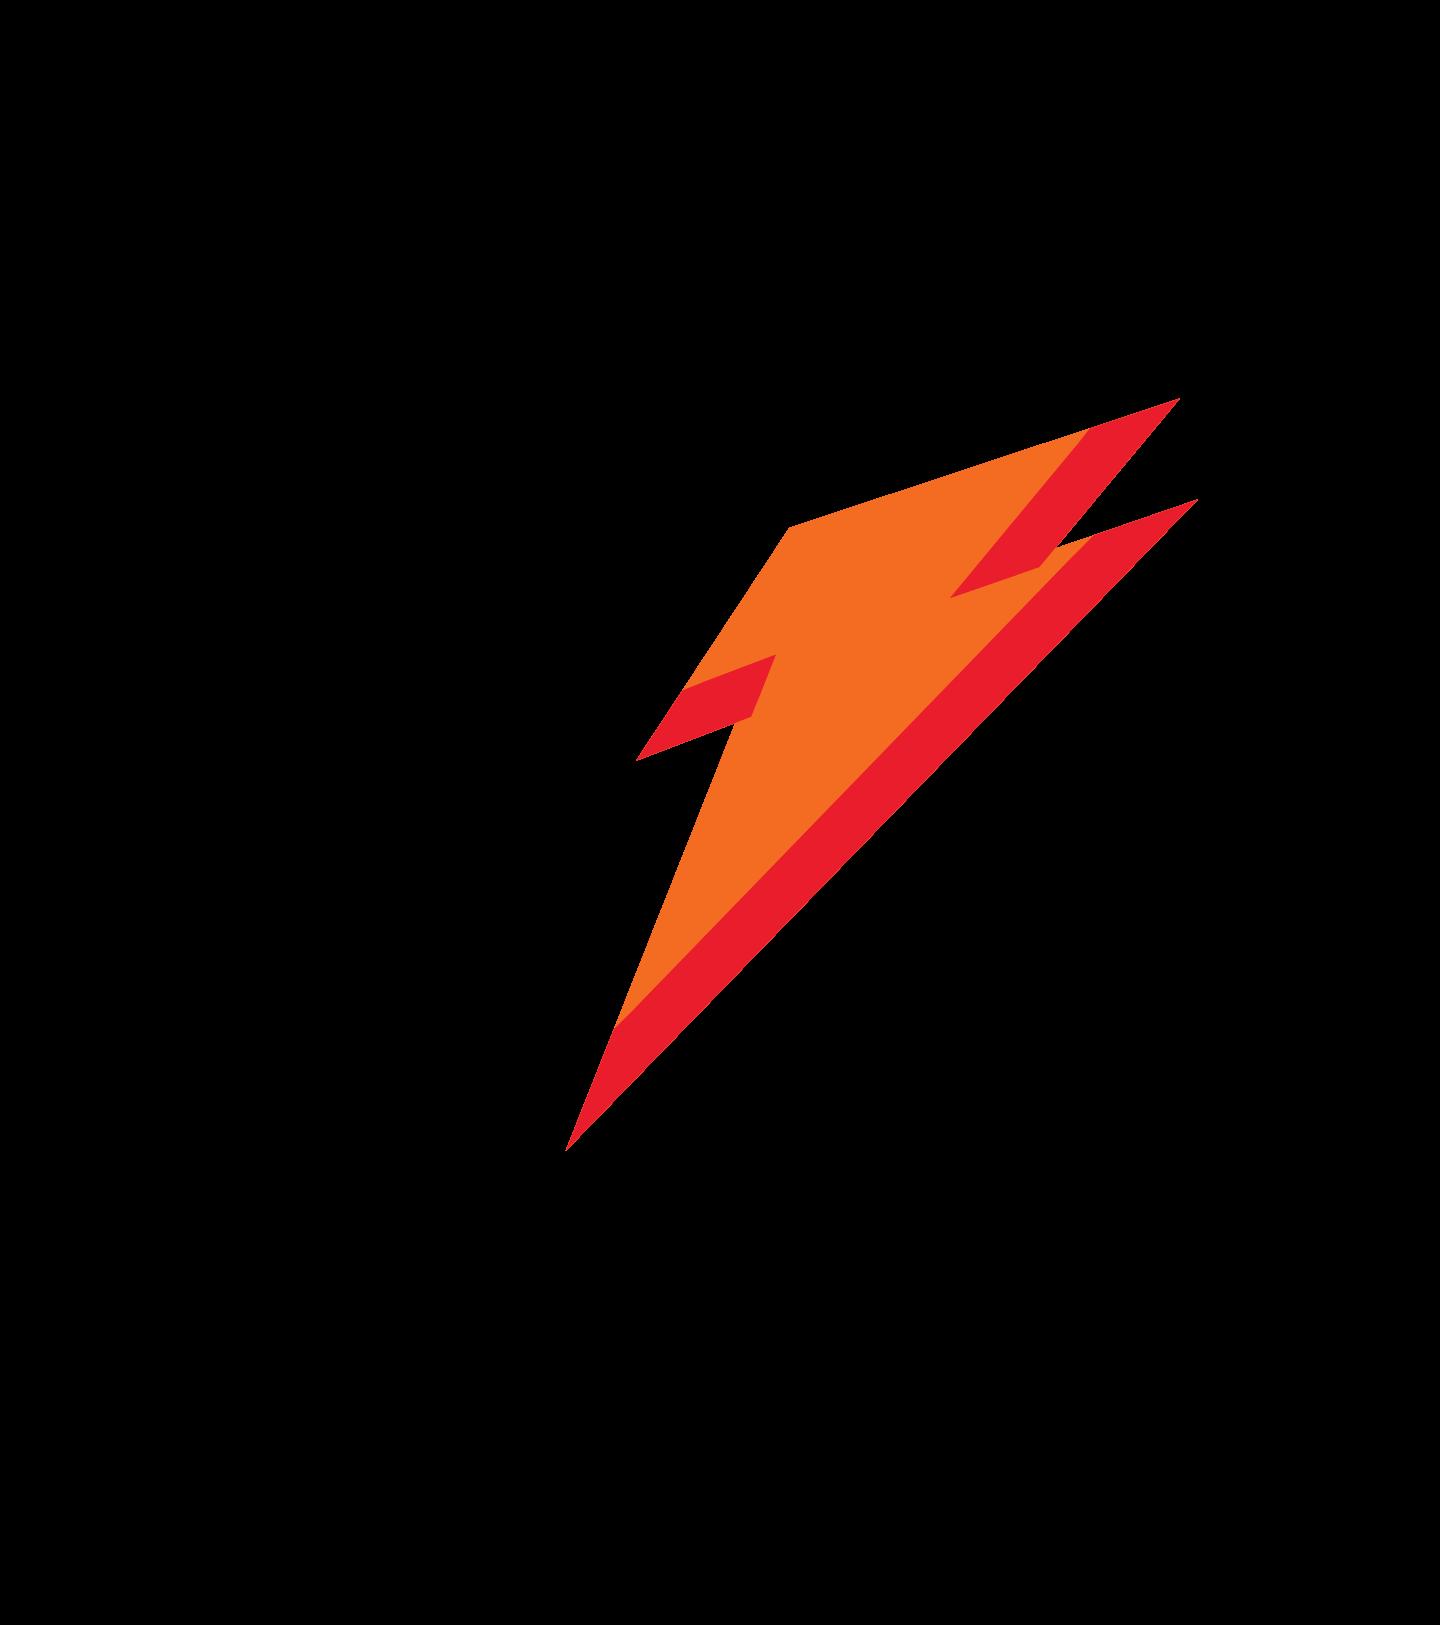 gatorade logo 7 - Gatorade Logo